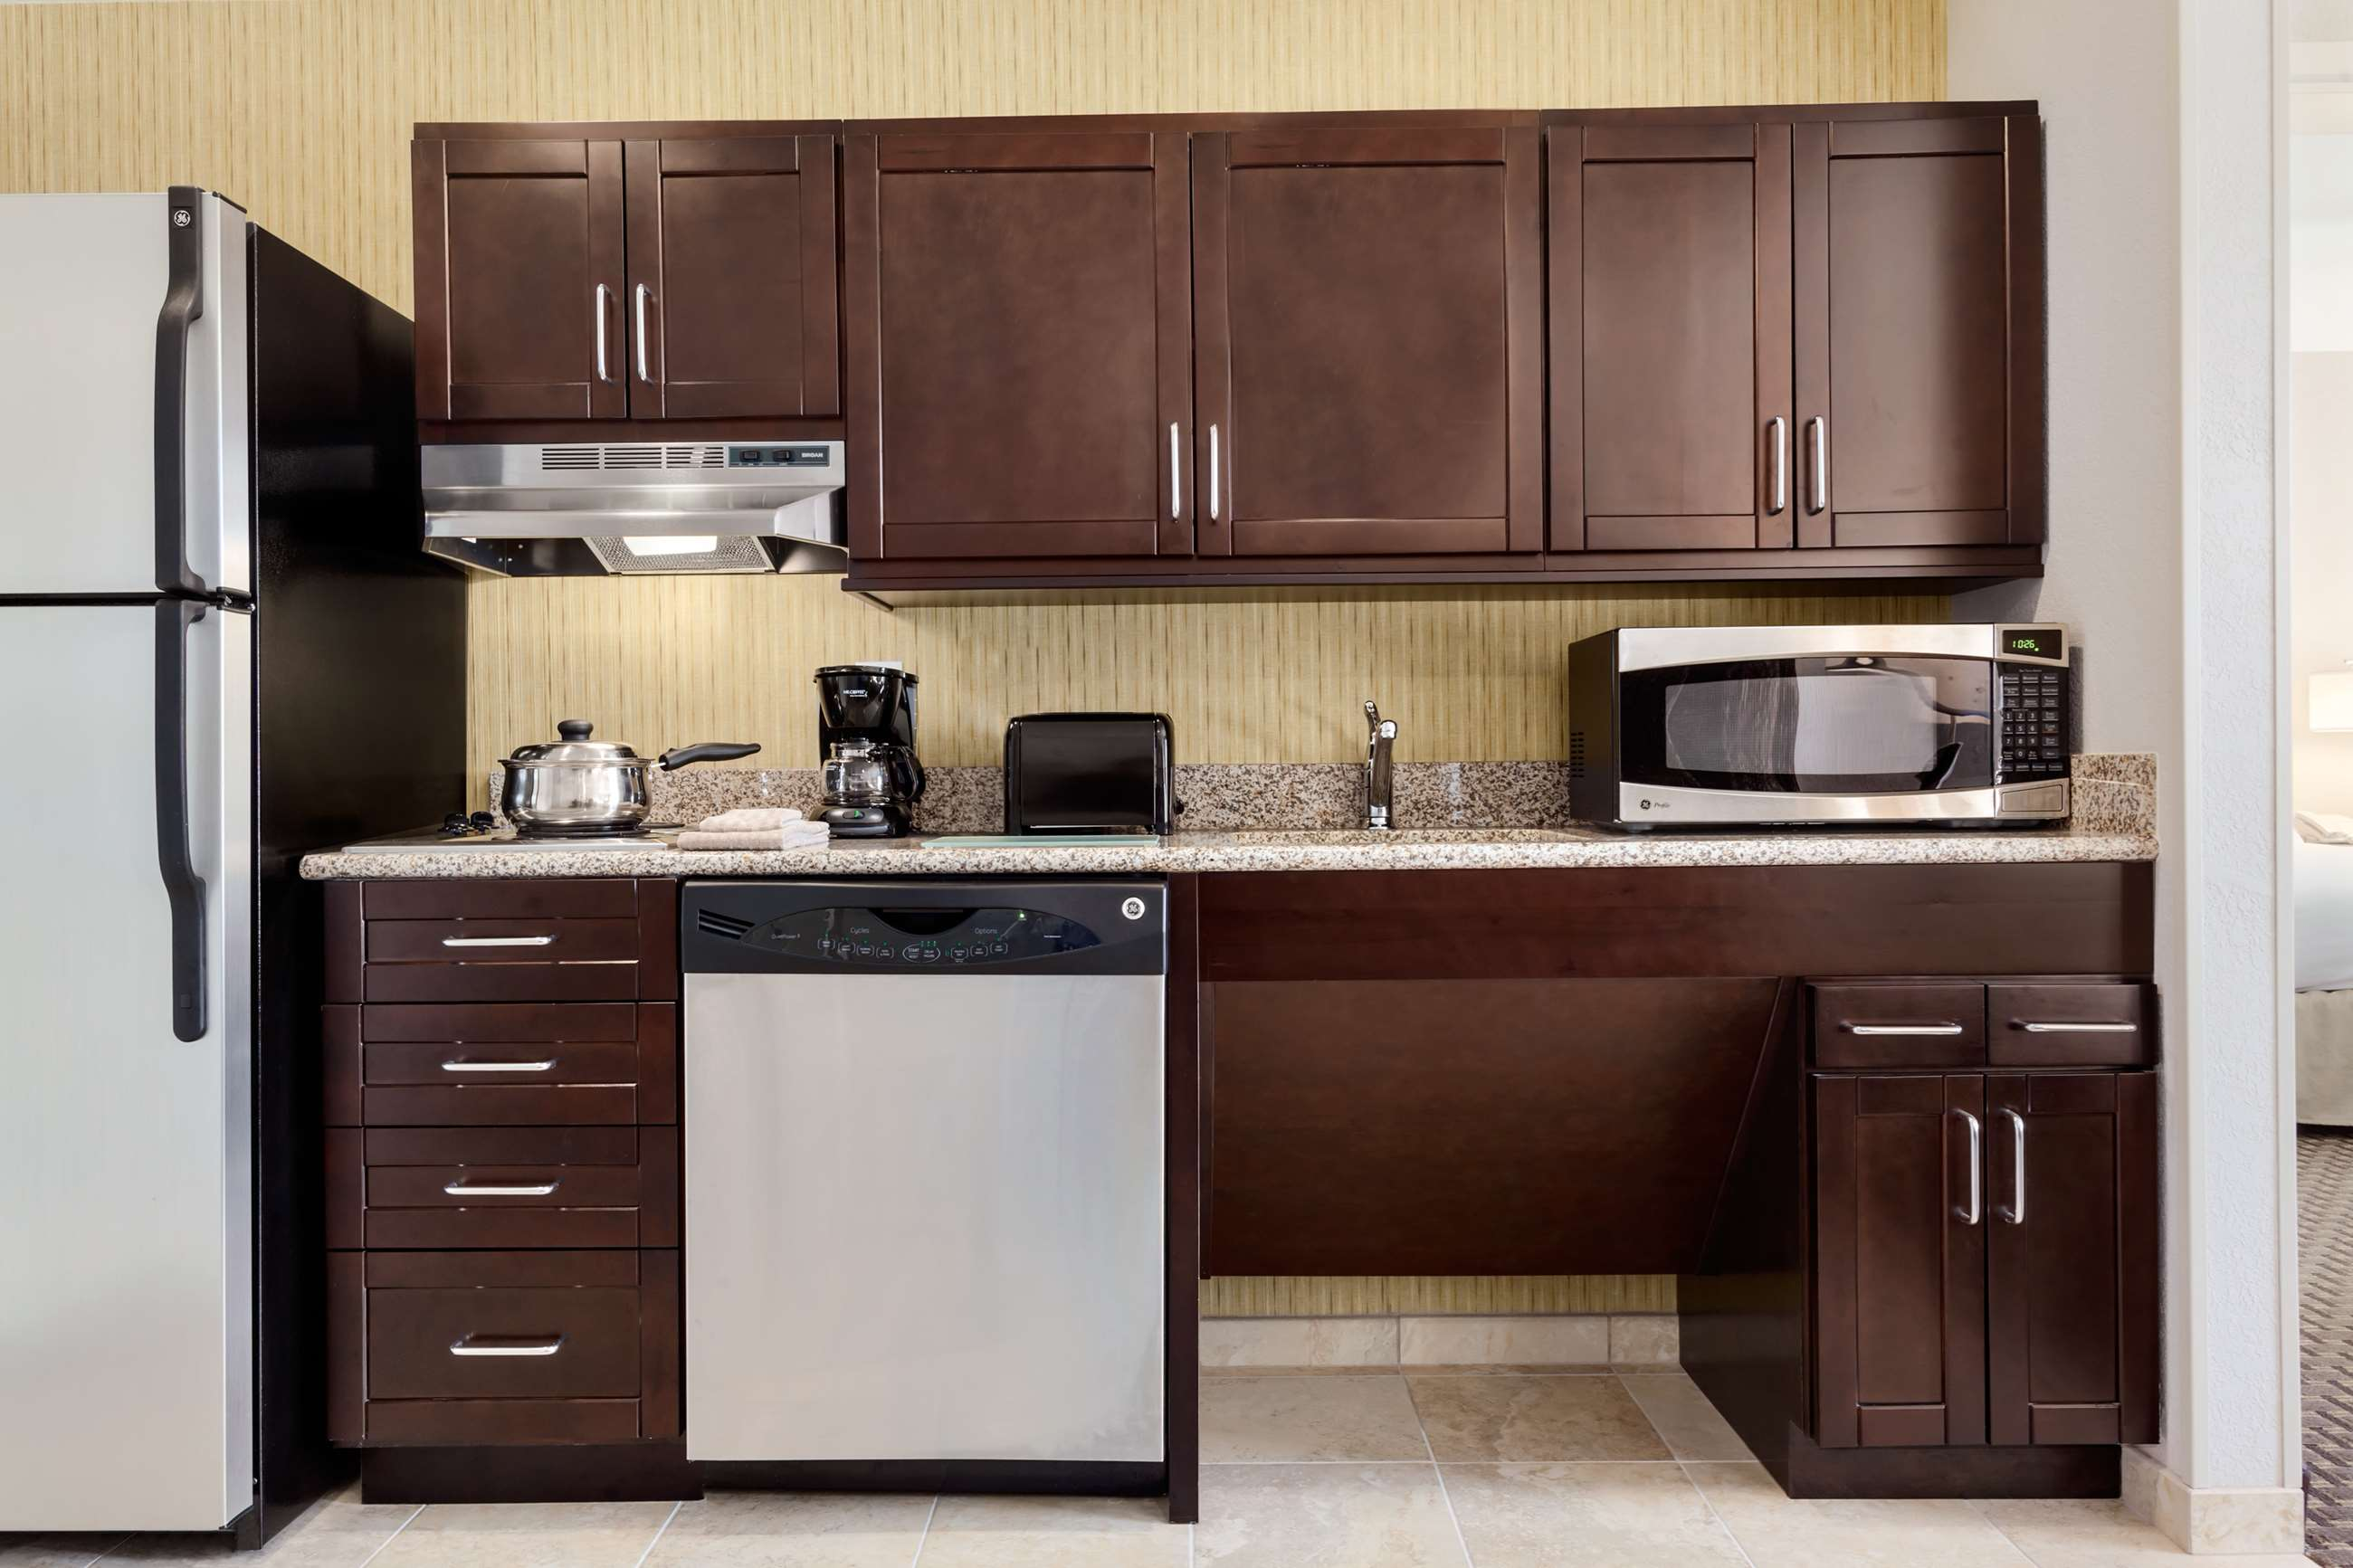 Homewood Suites by Hilton Joplin, MO image 7